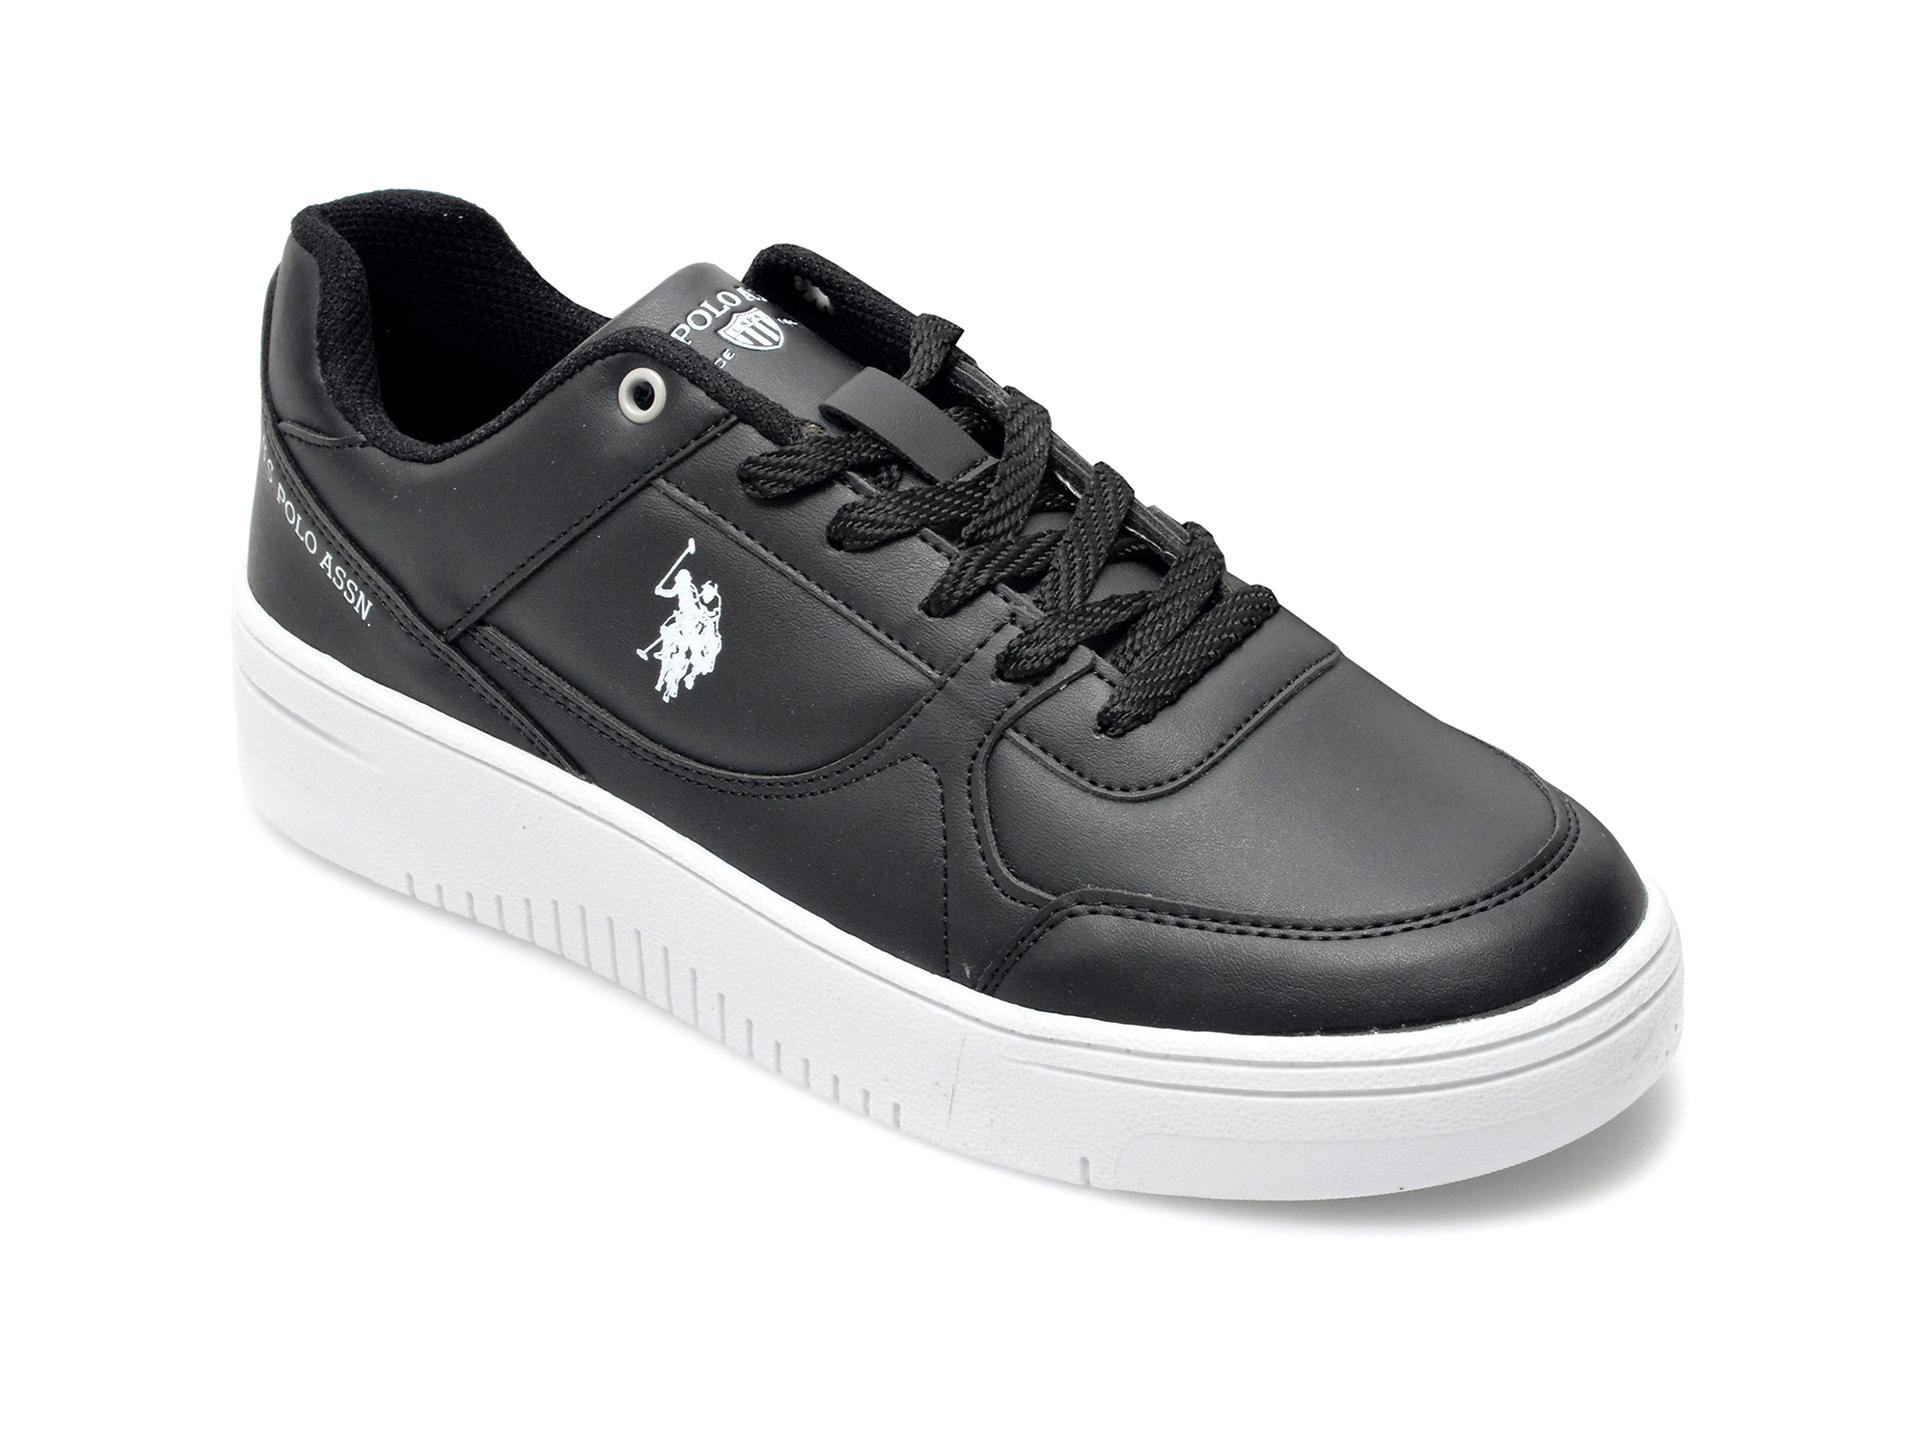 Pantofi sport US POLO ASSN negri, LEEWMN, din piele ecologica